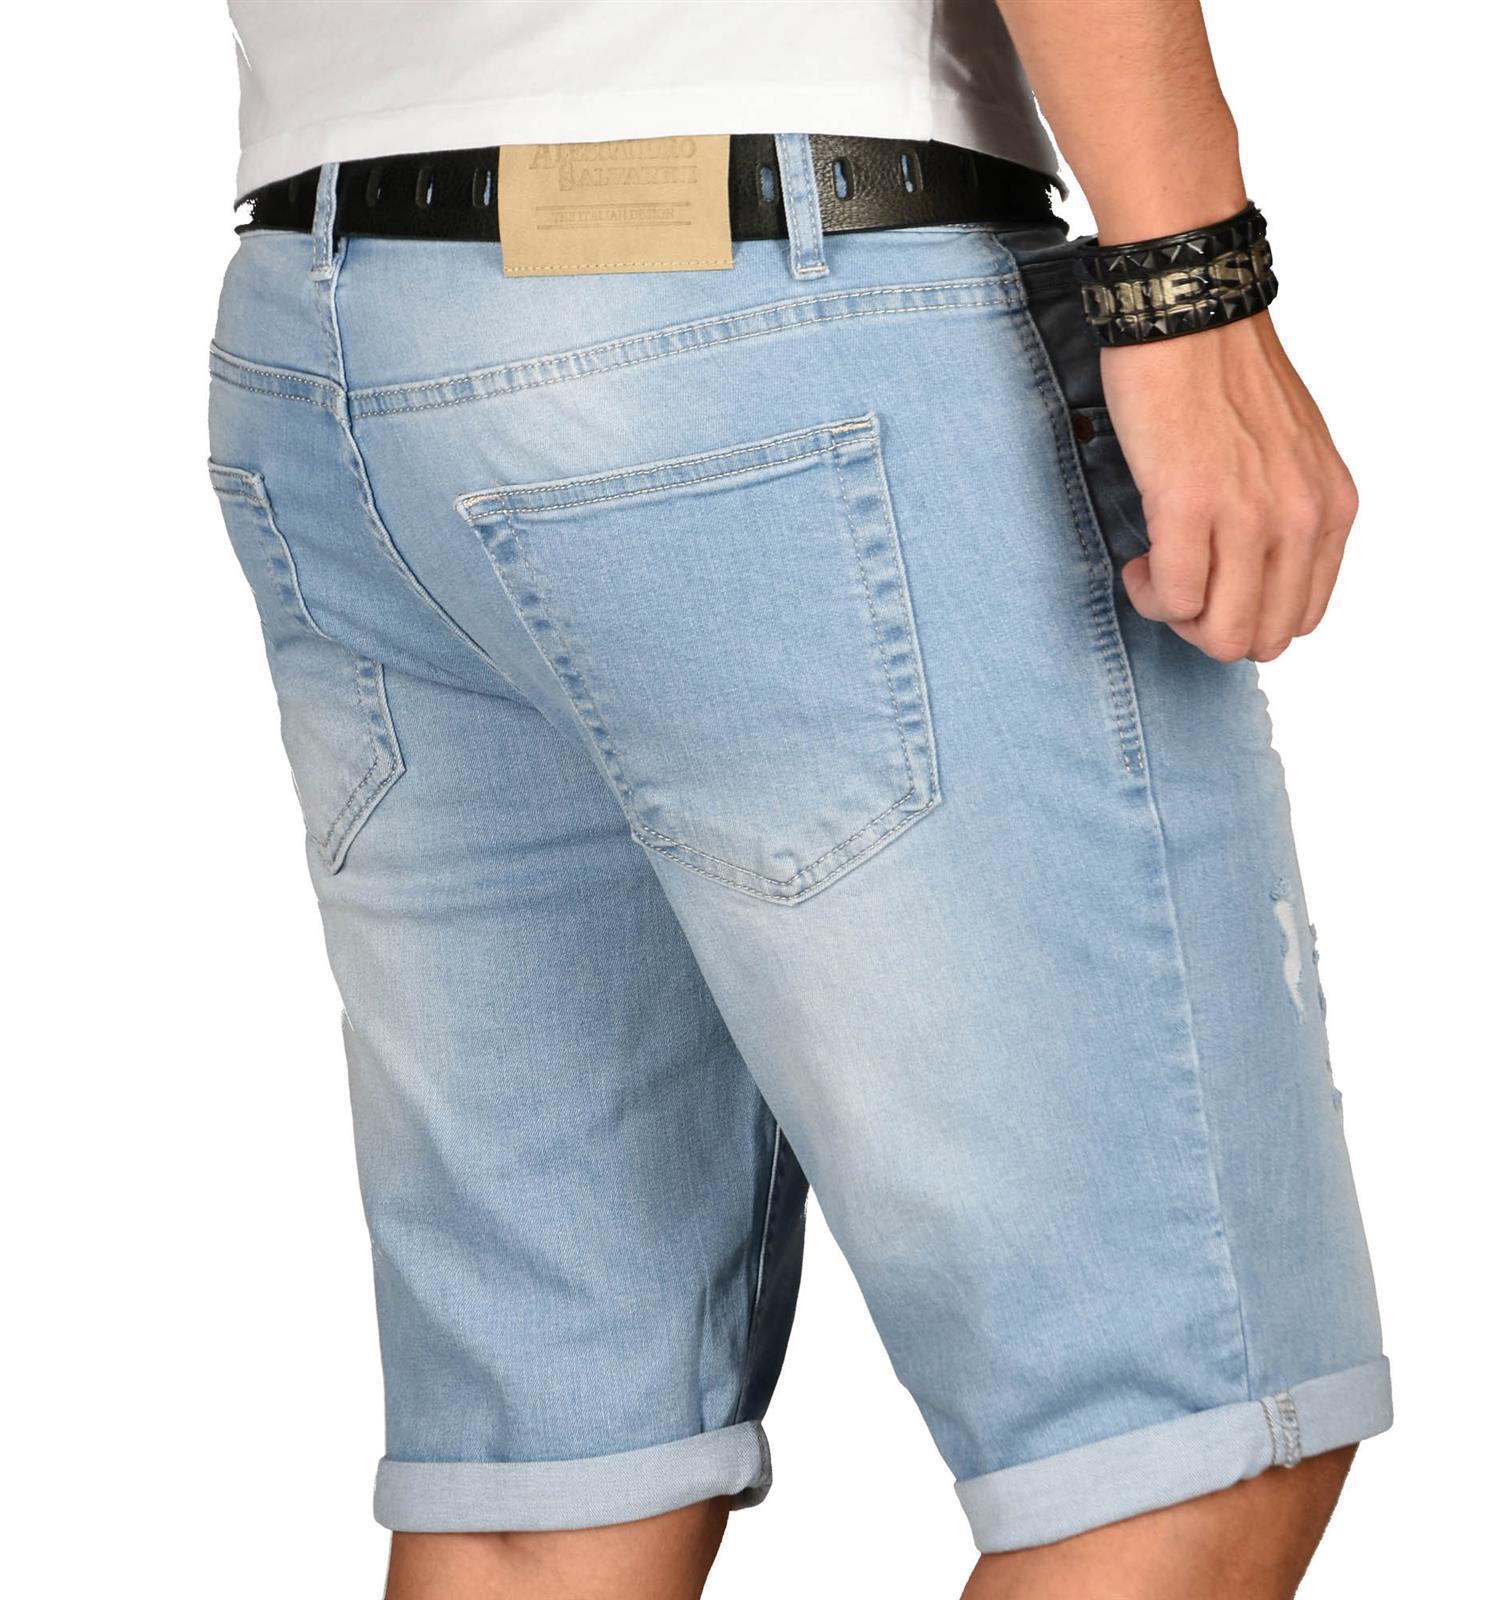 A-Salvarini-Herren-Designer-Jeans-Short-kurze-Hose-Slim-Sommer-Shorts-Washed Indexbild 16